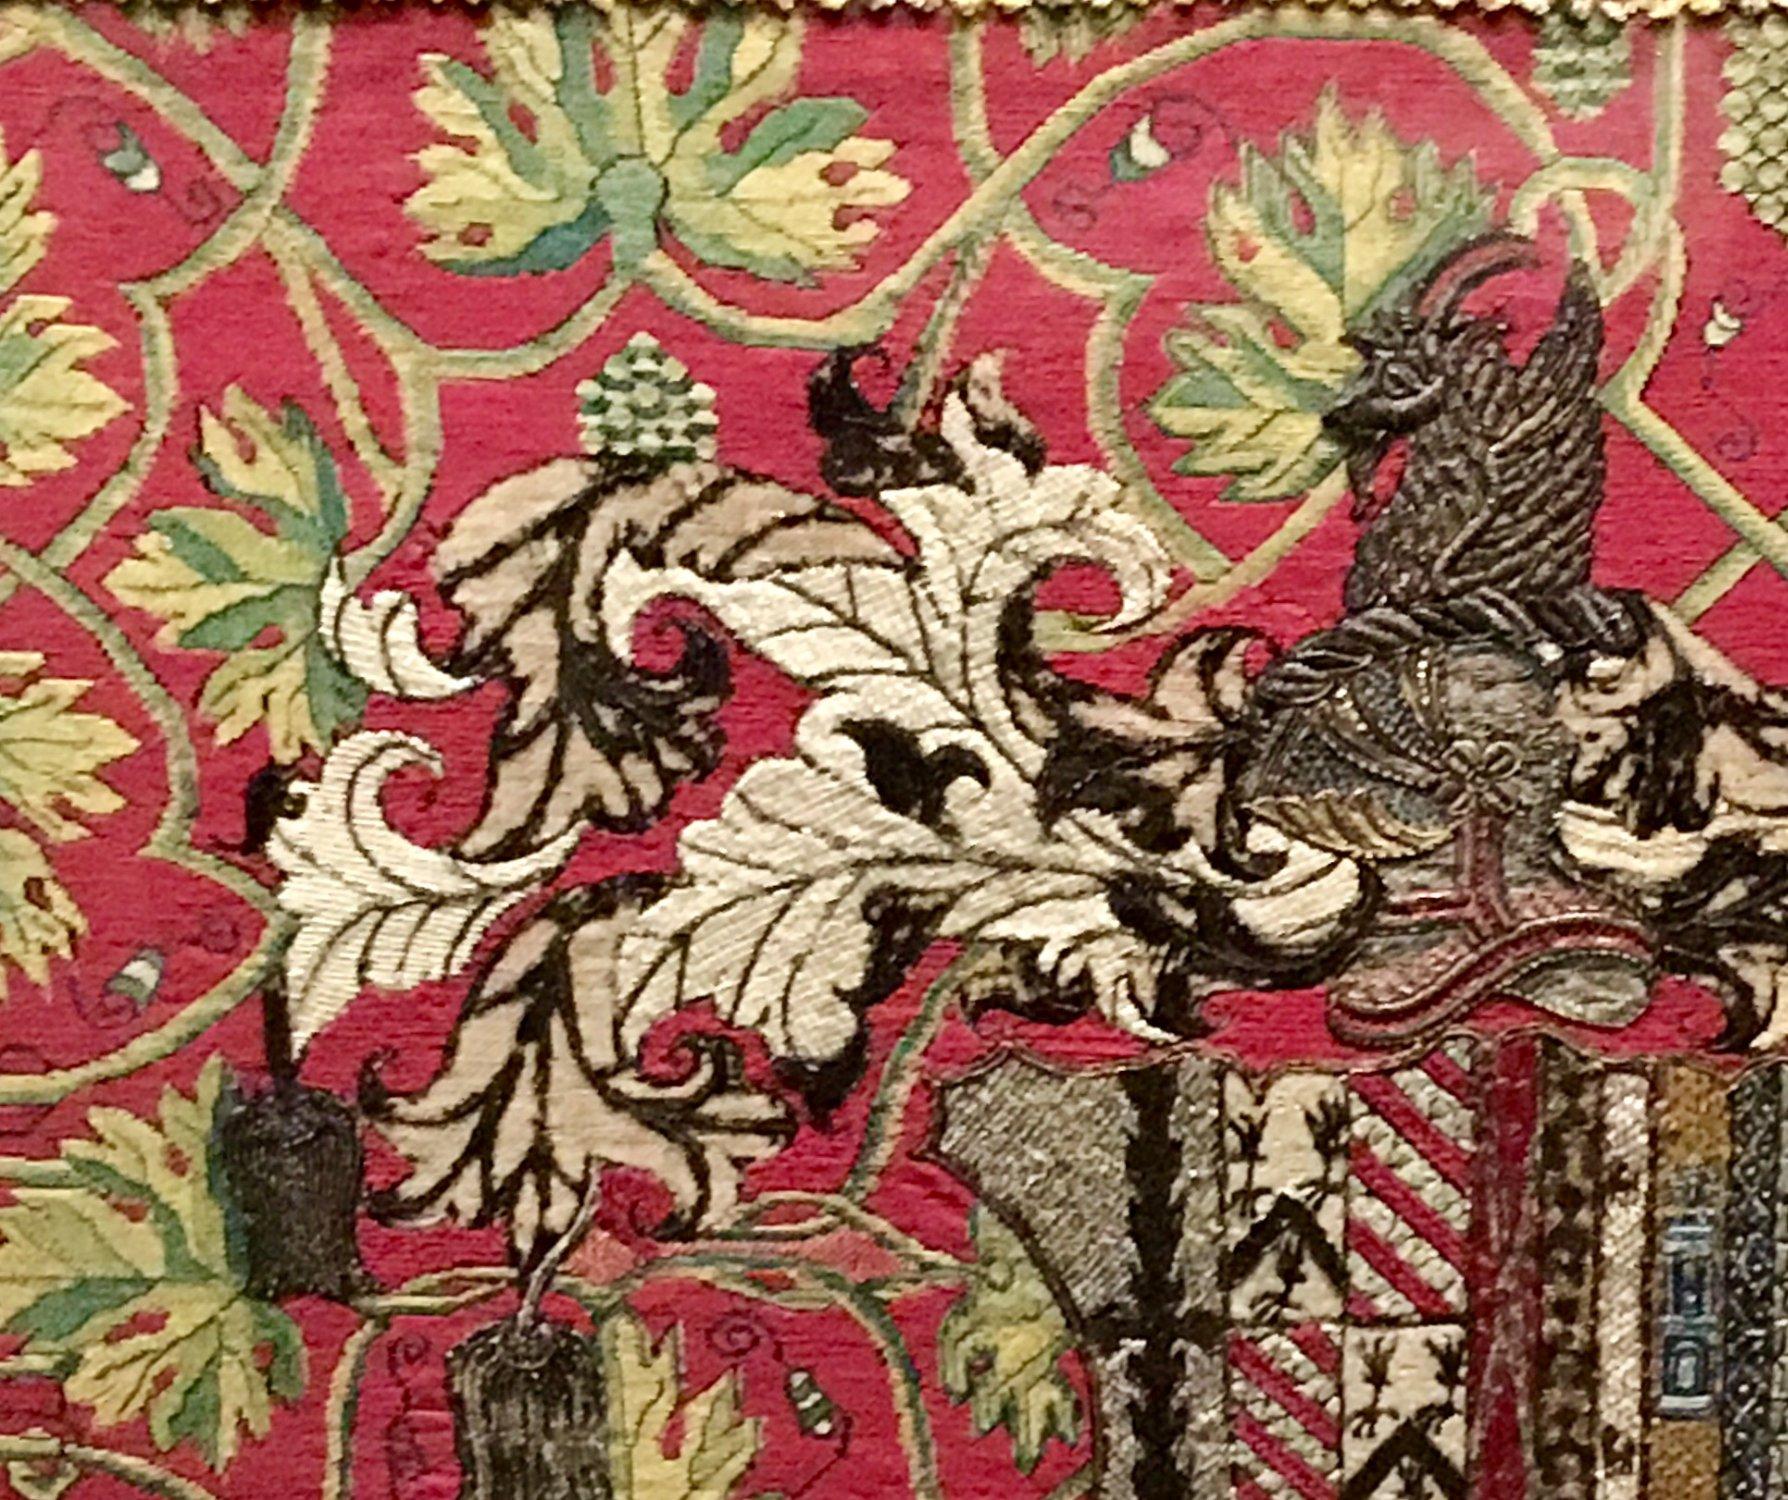 V&A museum heraldry tapestry